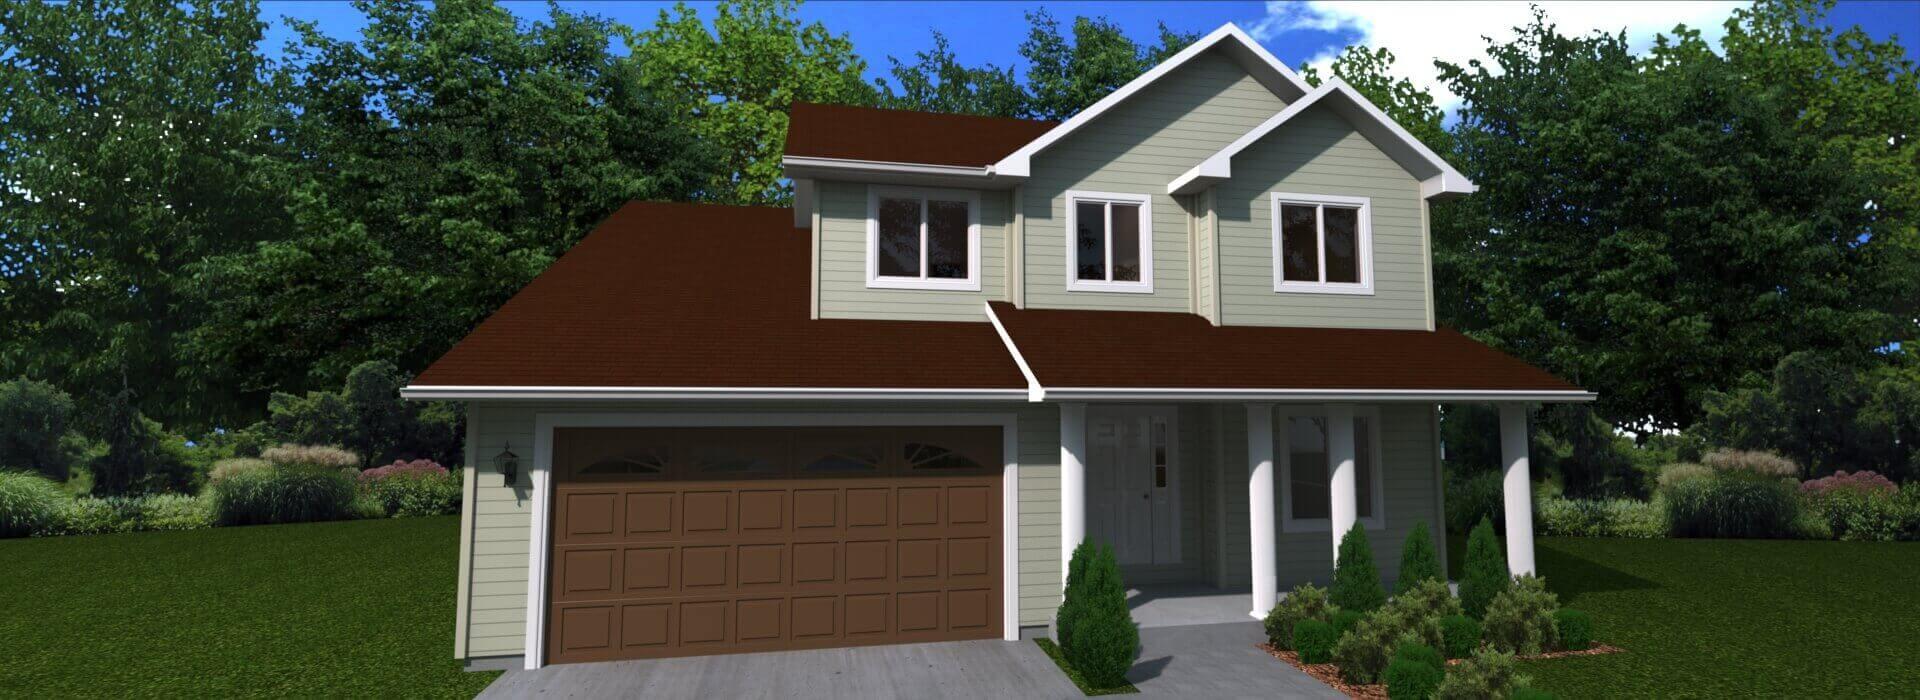 1855 house elevation